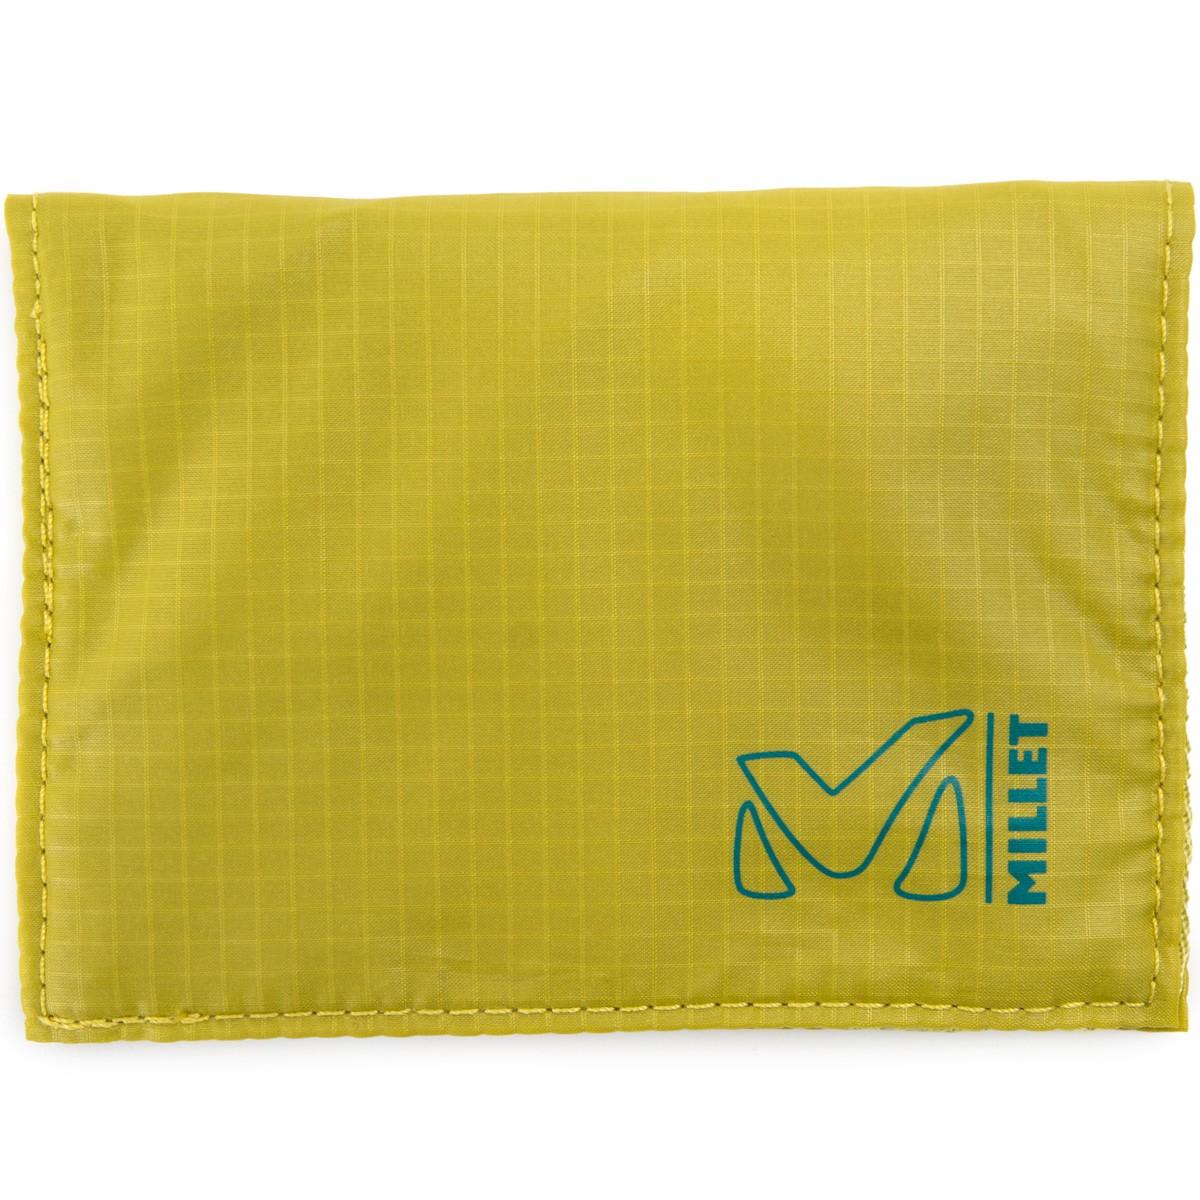 MILLET wallet ワレット